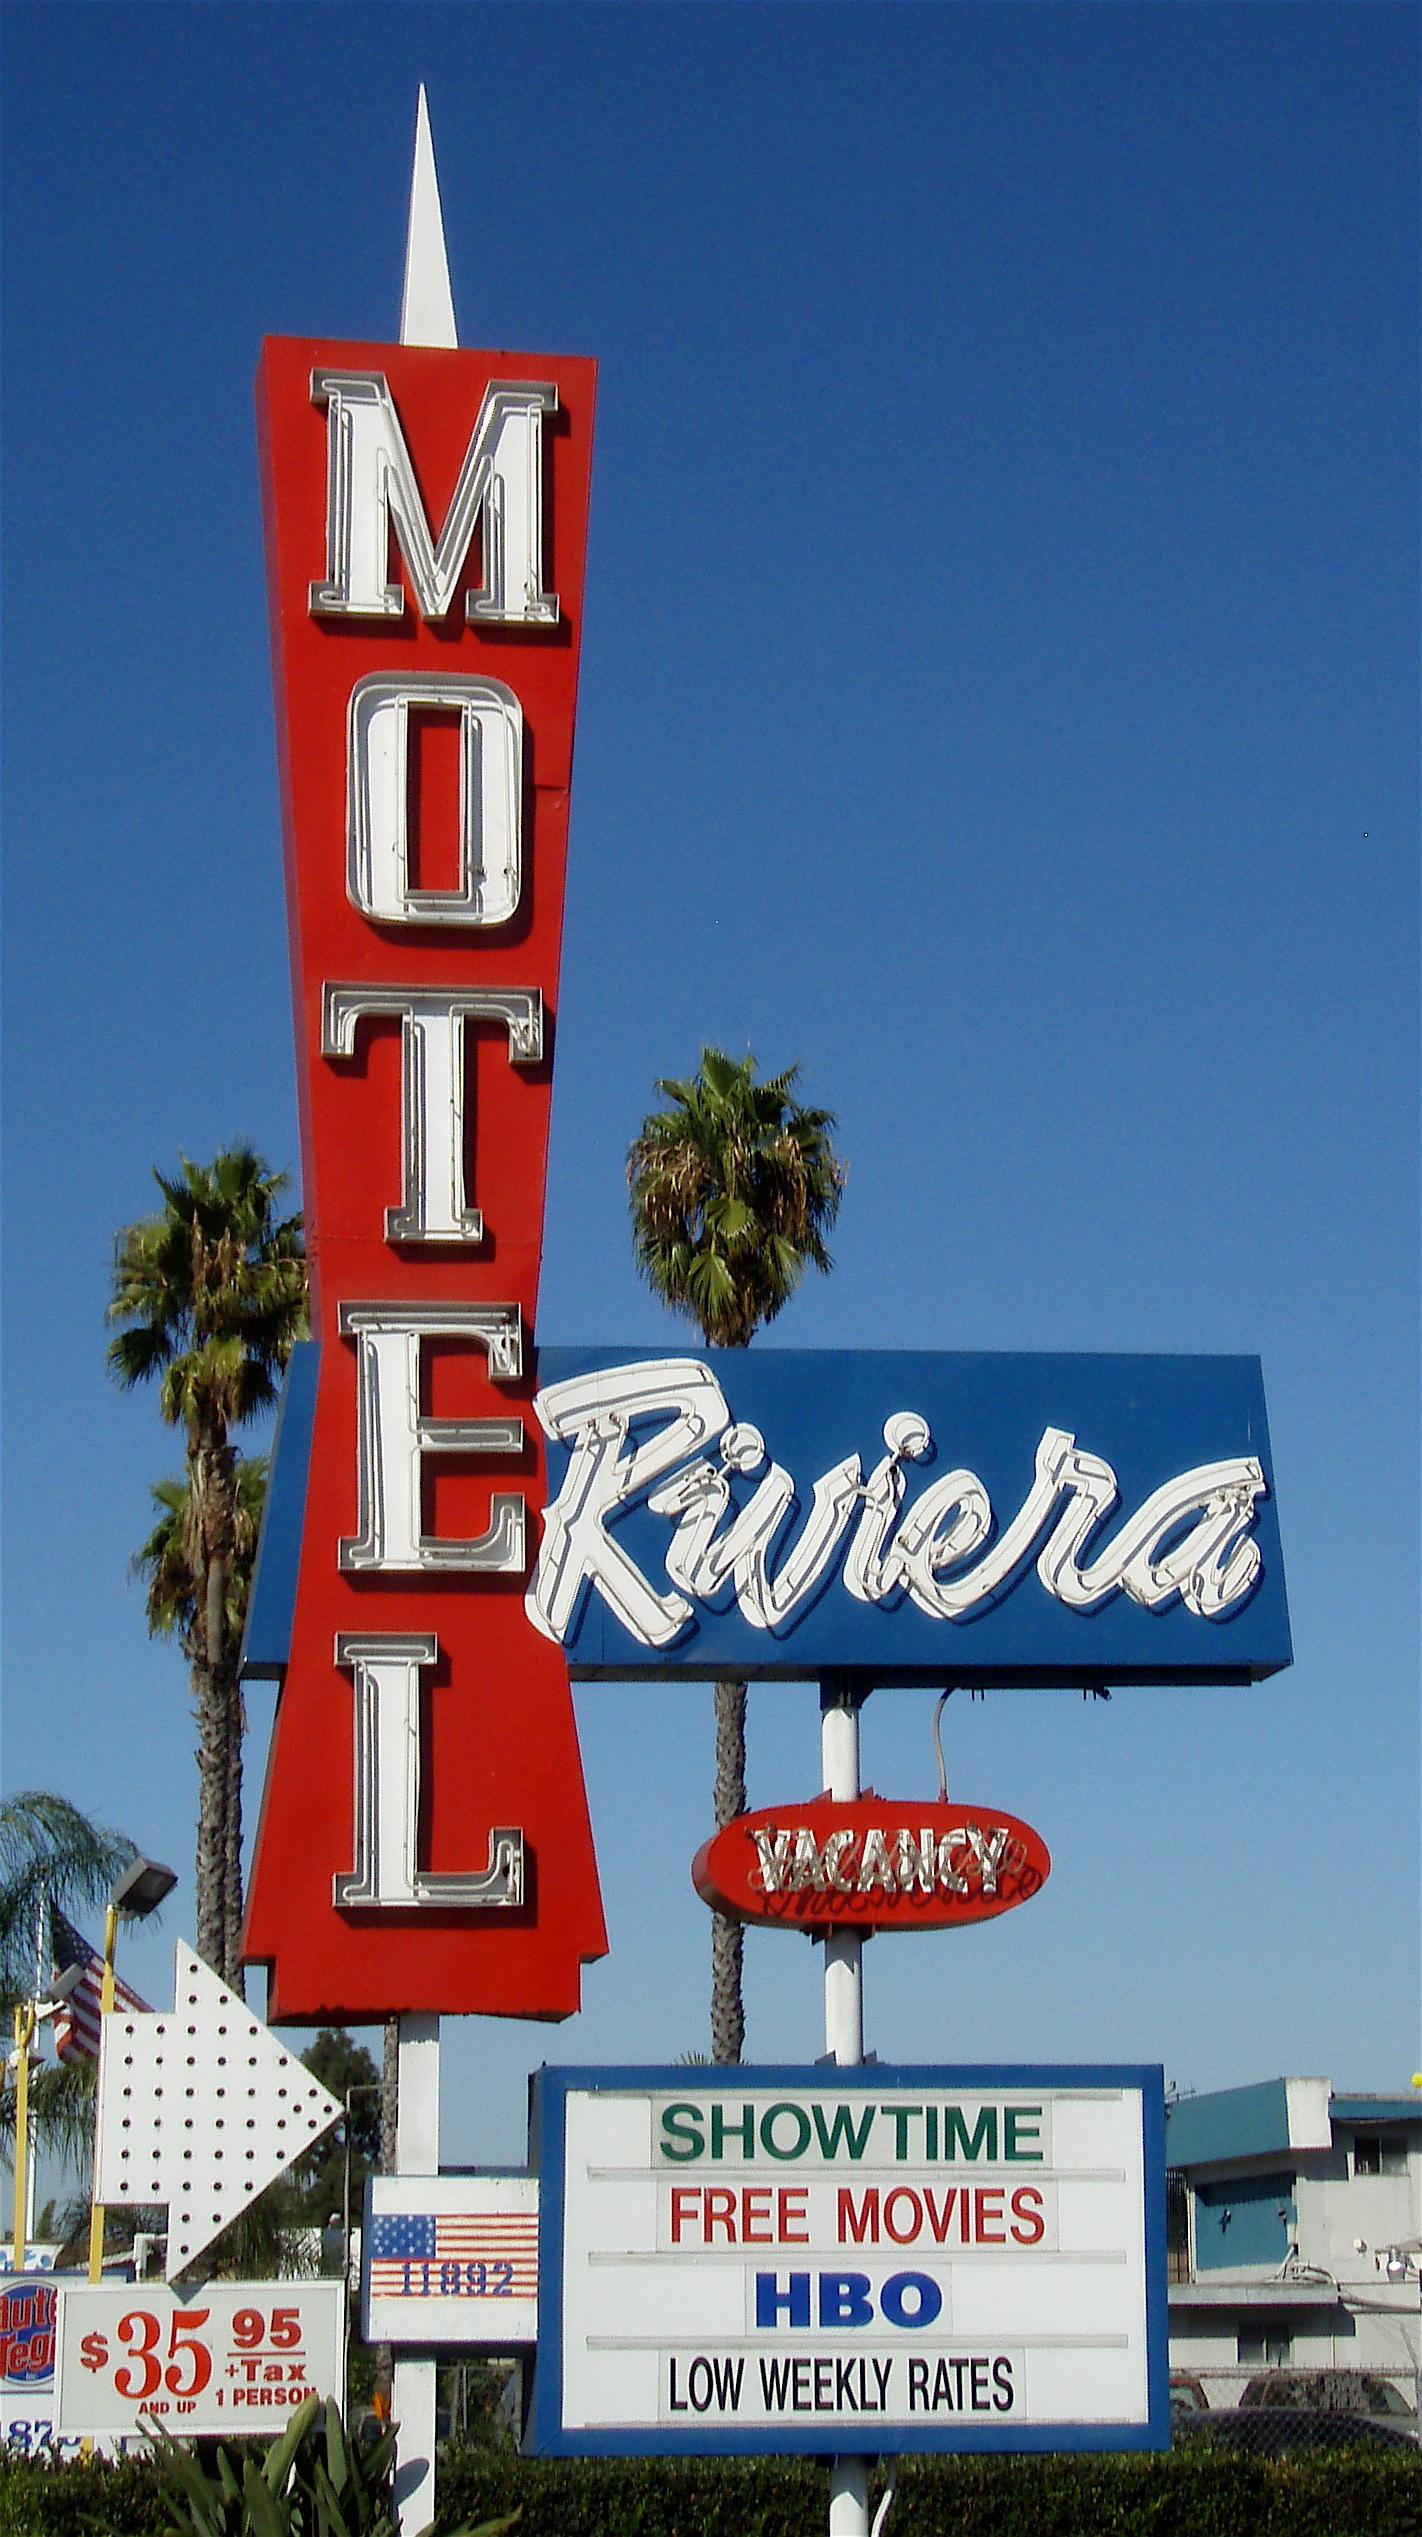 Riviera Motel - 11892 Beach Boulevard, Stanton, California U.S.A. - October 24, 2008